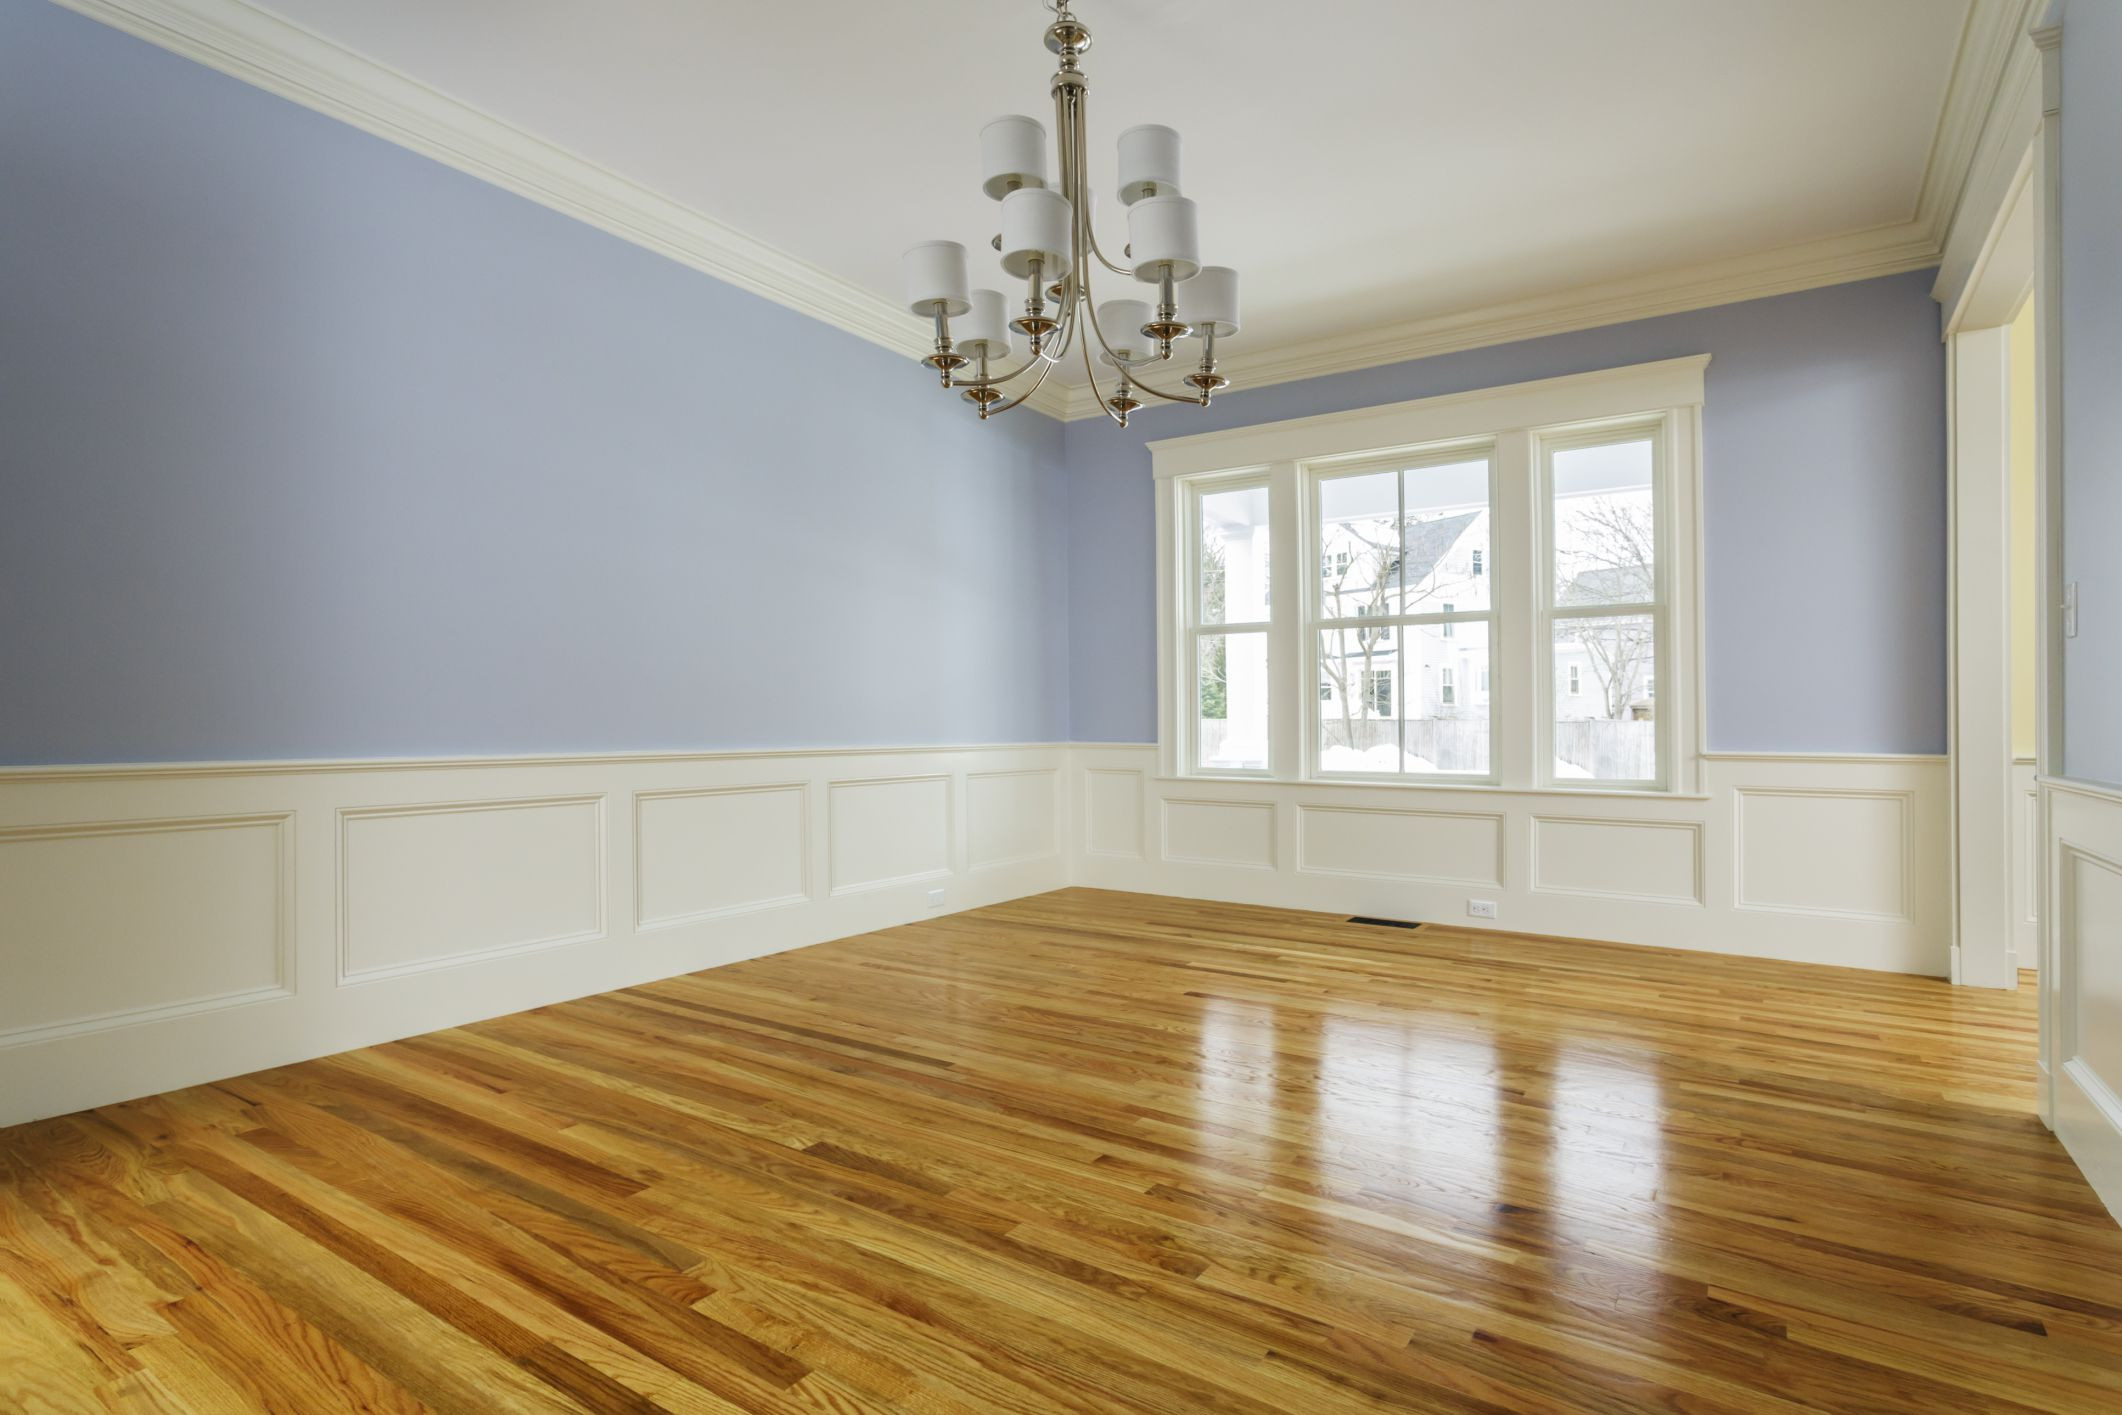 dark walnut hardwood floors of how to make hardwood floors shiny regarding 168686572 56a4e87c3df78cf7728544a2